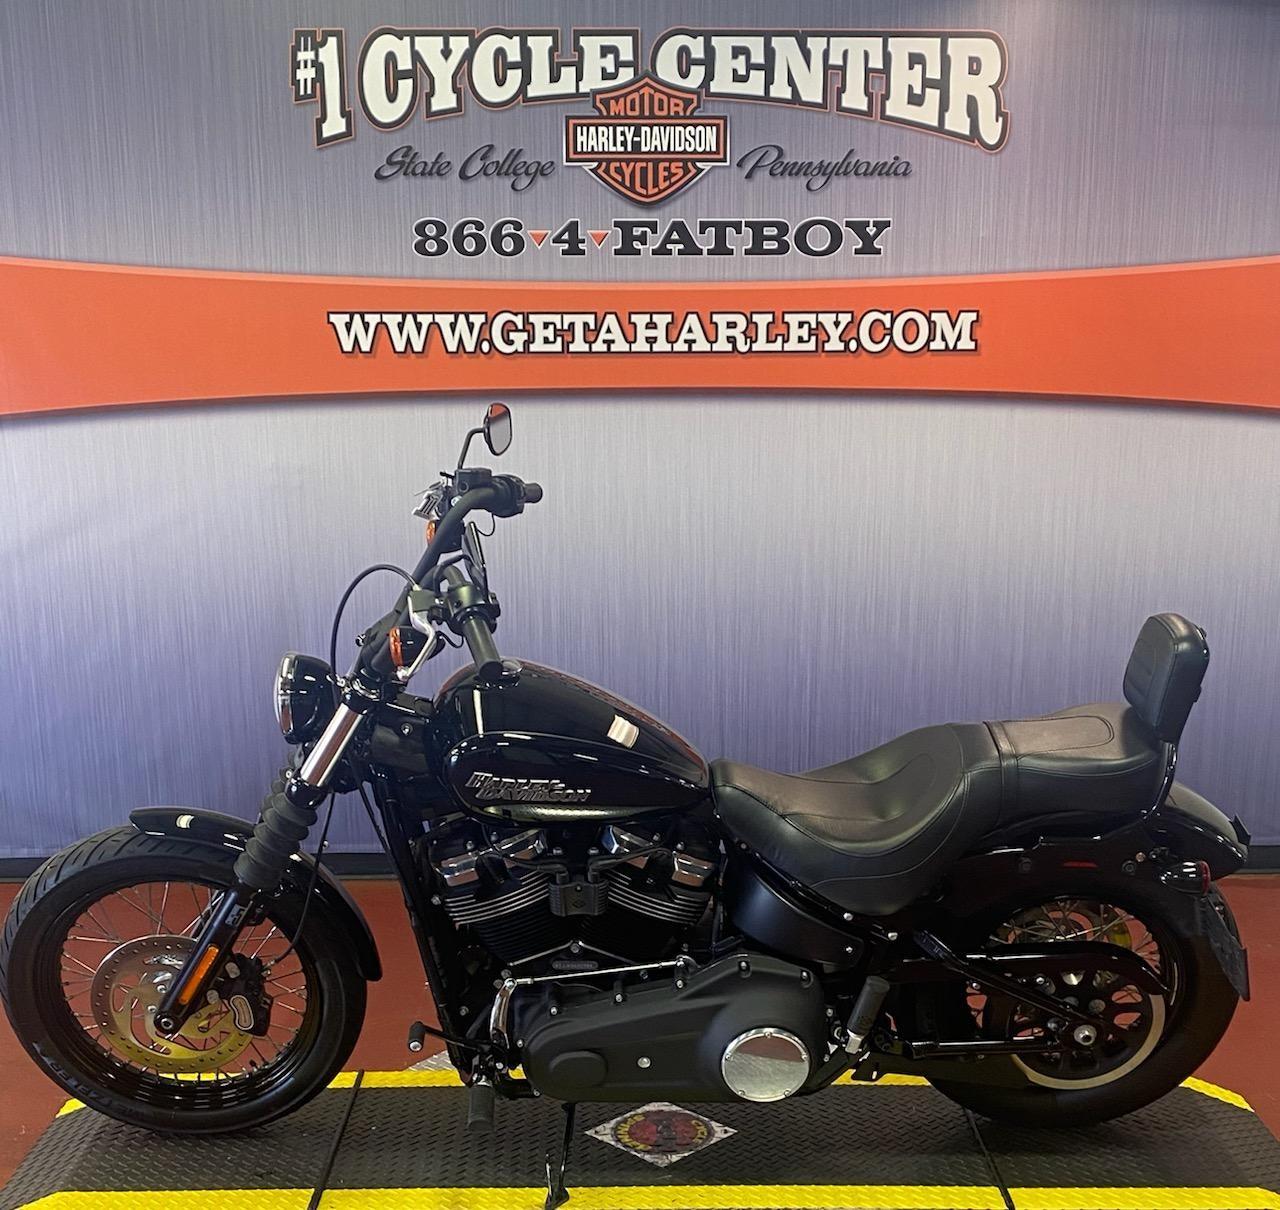 2019 Harley-Davidson Softail Street Bob at #1 Cycle Center Harley-Davidson